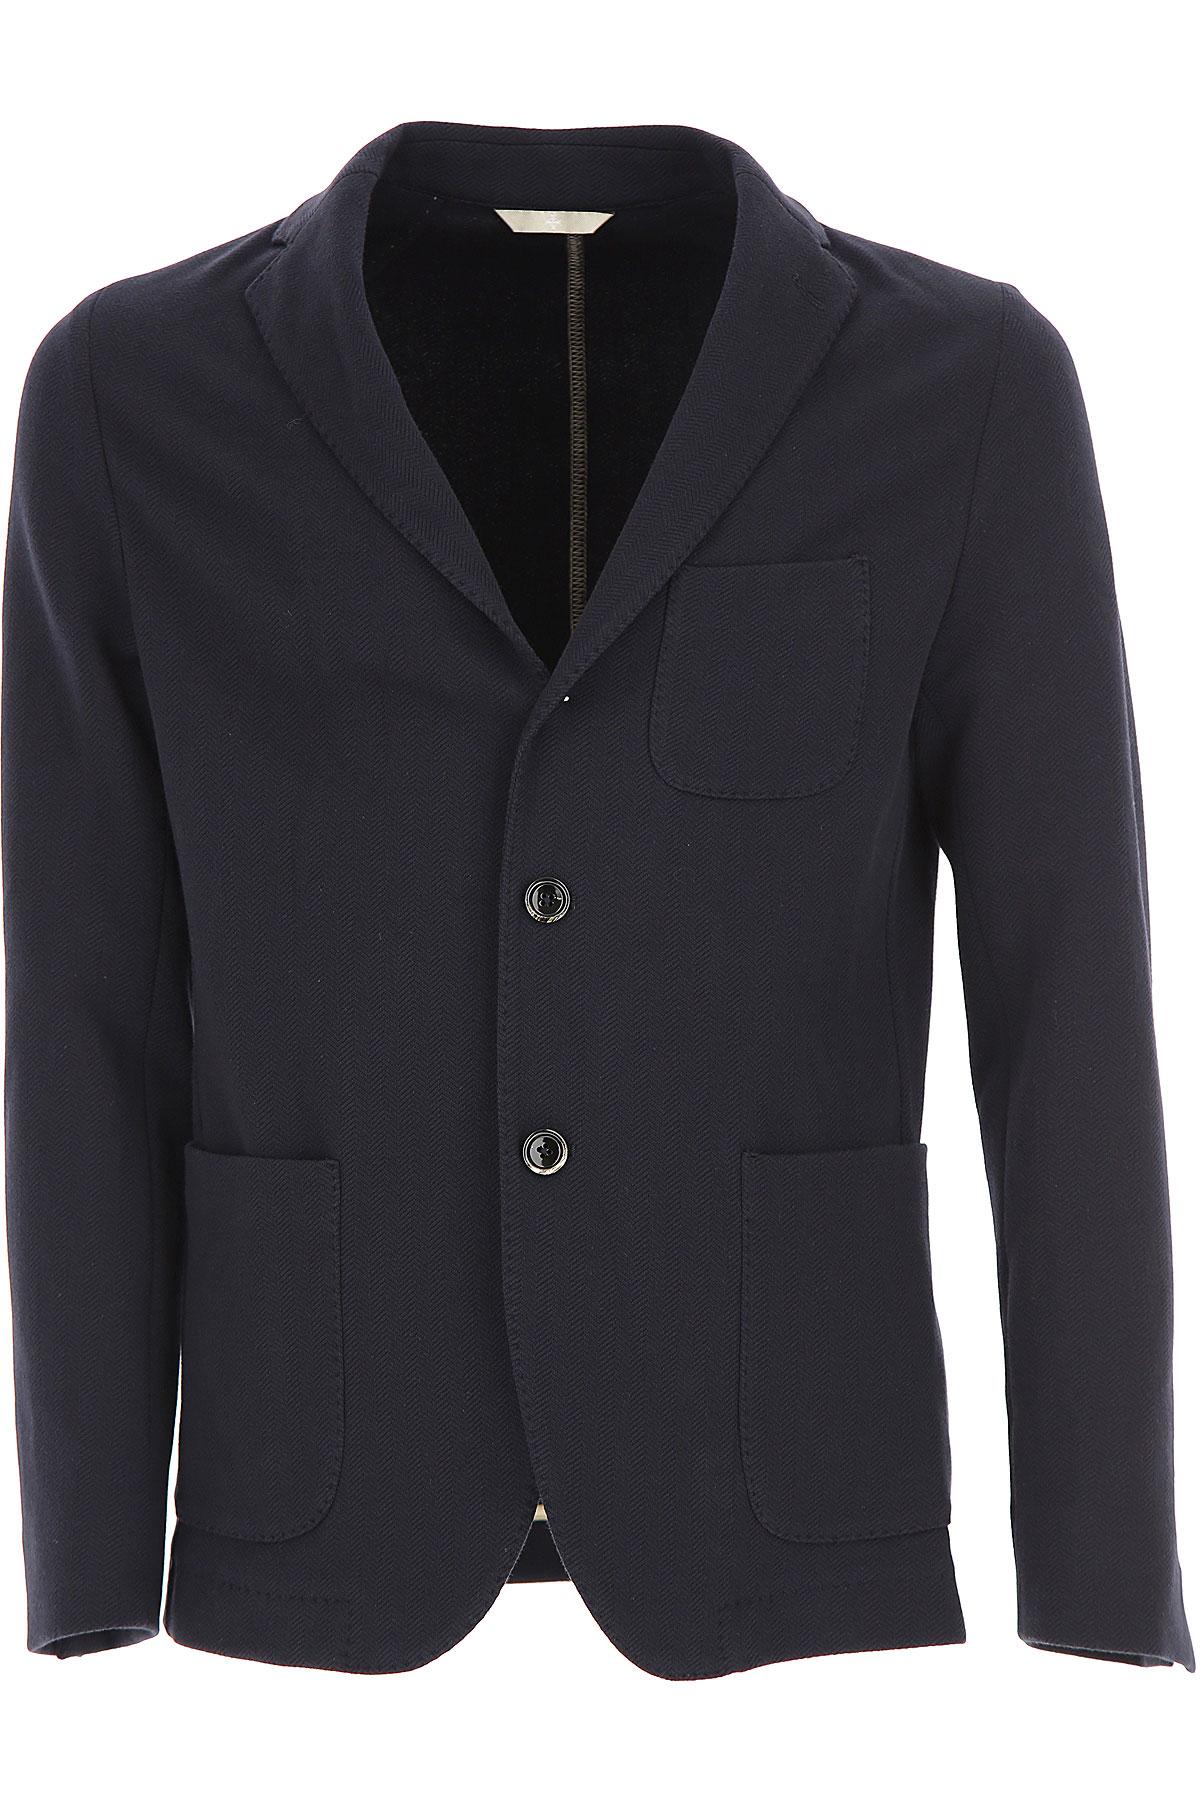 Simbols Blazer for Men, Sport Coat On Sale, Blue Navy, Cotton, 2019, L M XXL